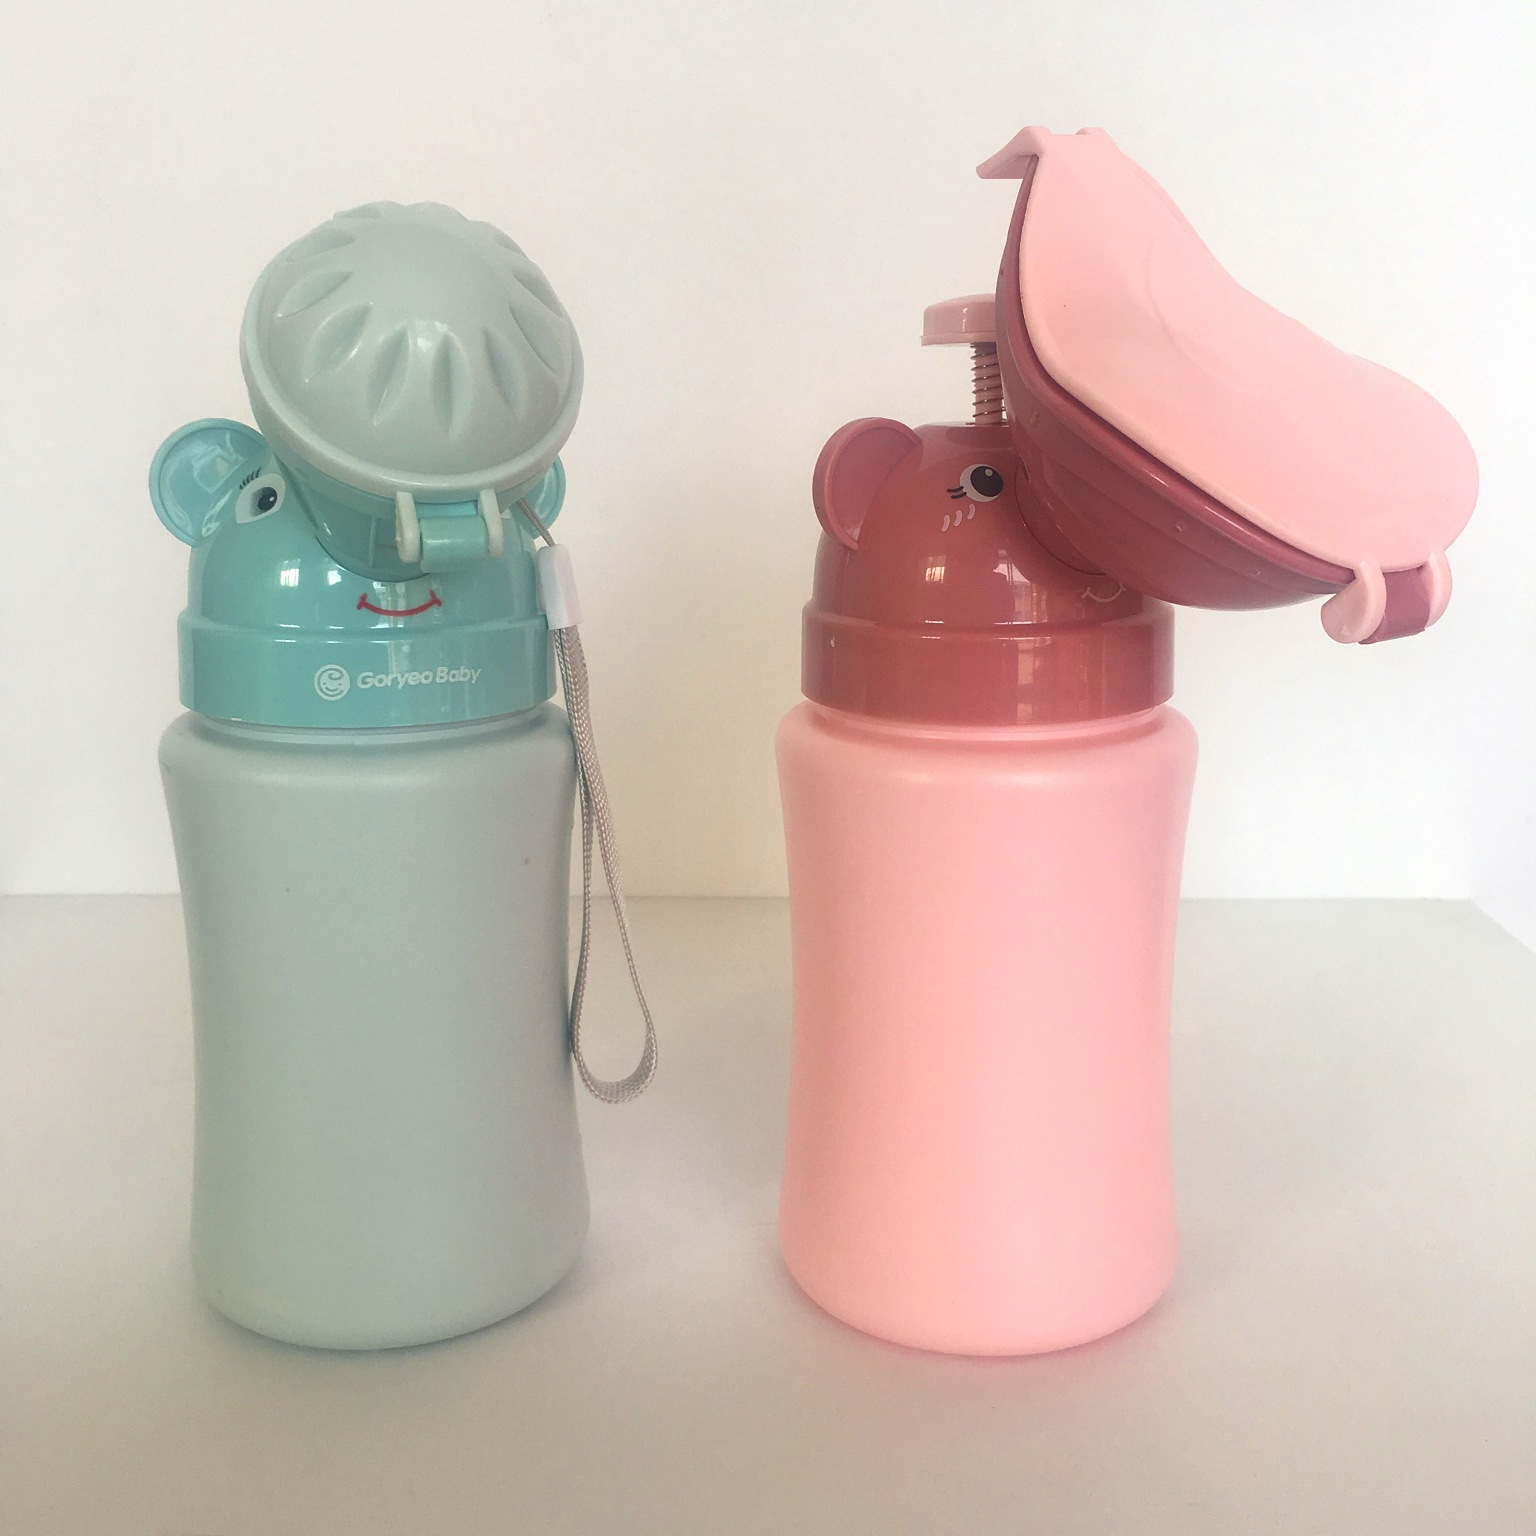 Mini Creative Convenient Infants Child Urinal Men And Women Baby Xiao Bian Hu Portable Leak-Proof Car Mounted Urinal